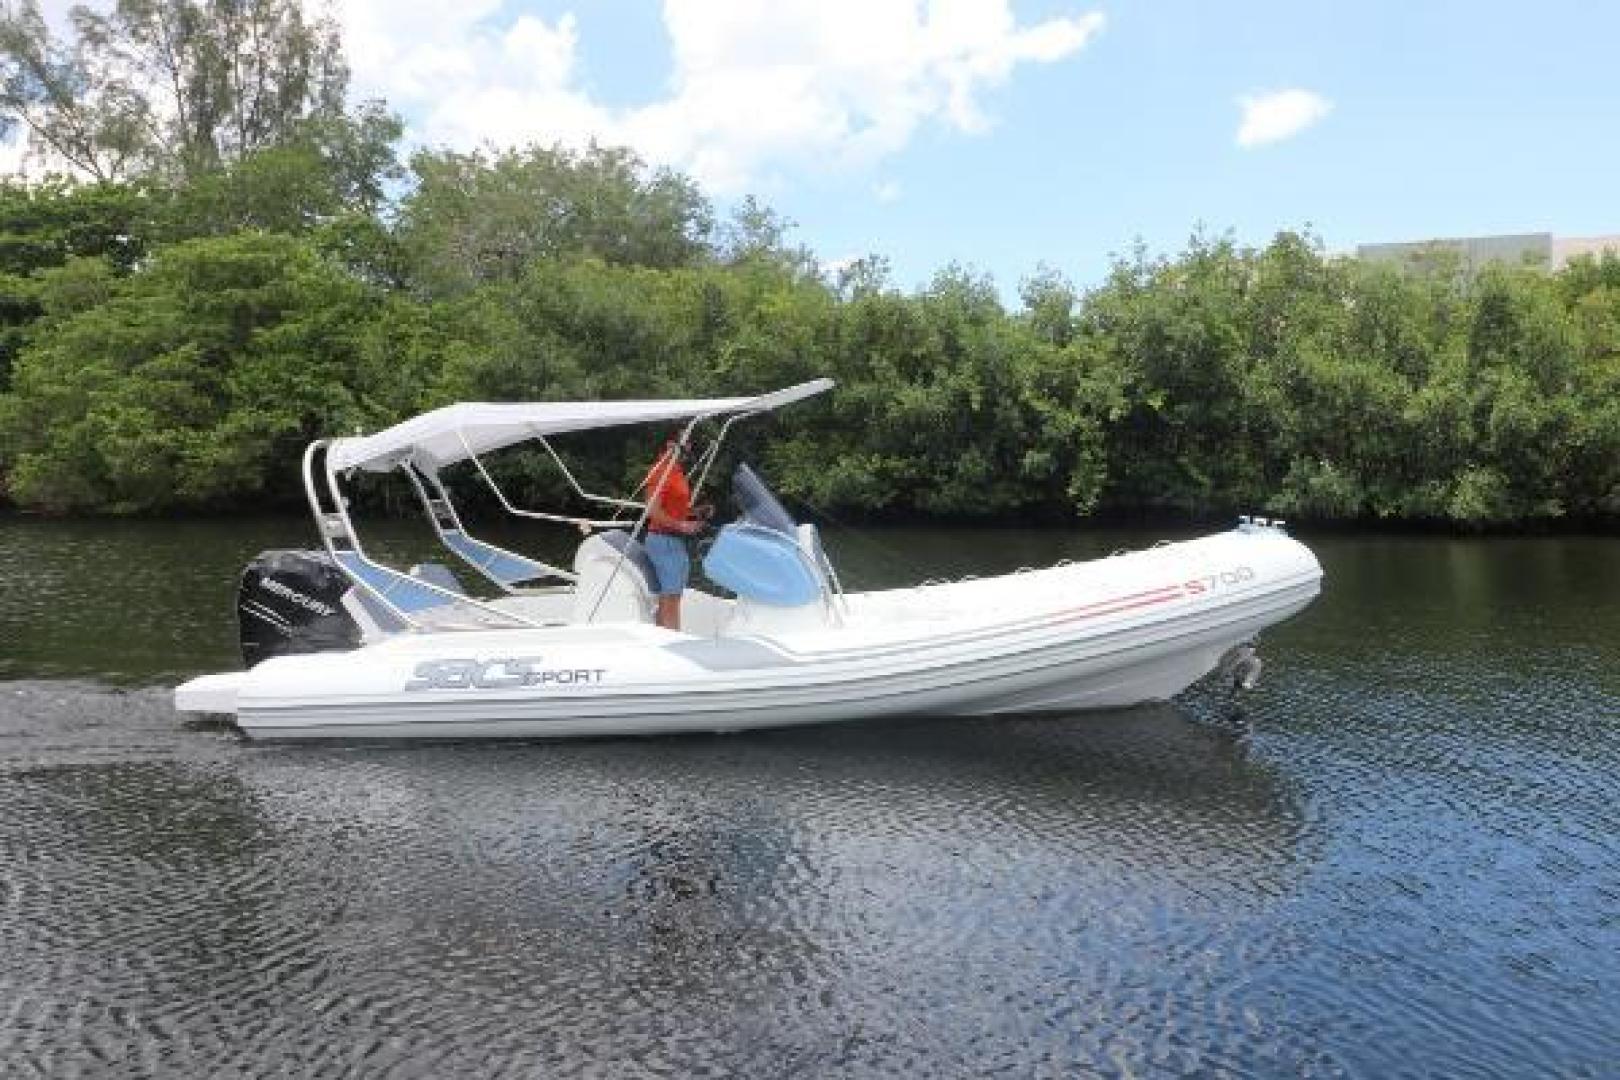 Sacs-Sport 700 2016-Sacs Sport 700 Fort Lauderdale-Florida-United States-1521557 | Thumbnail